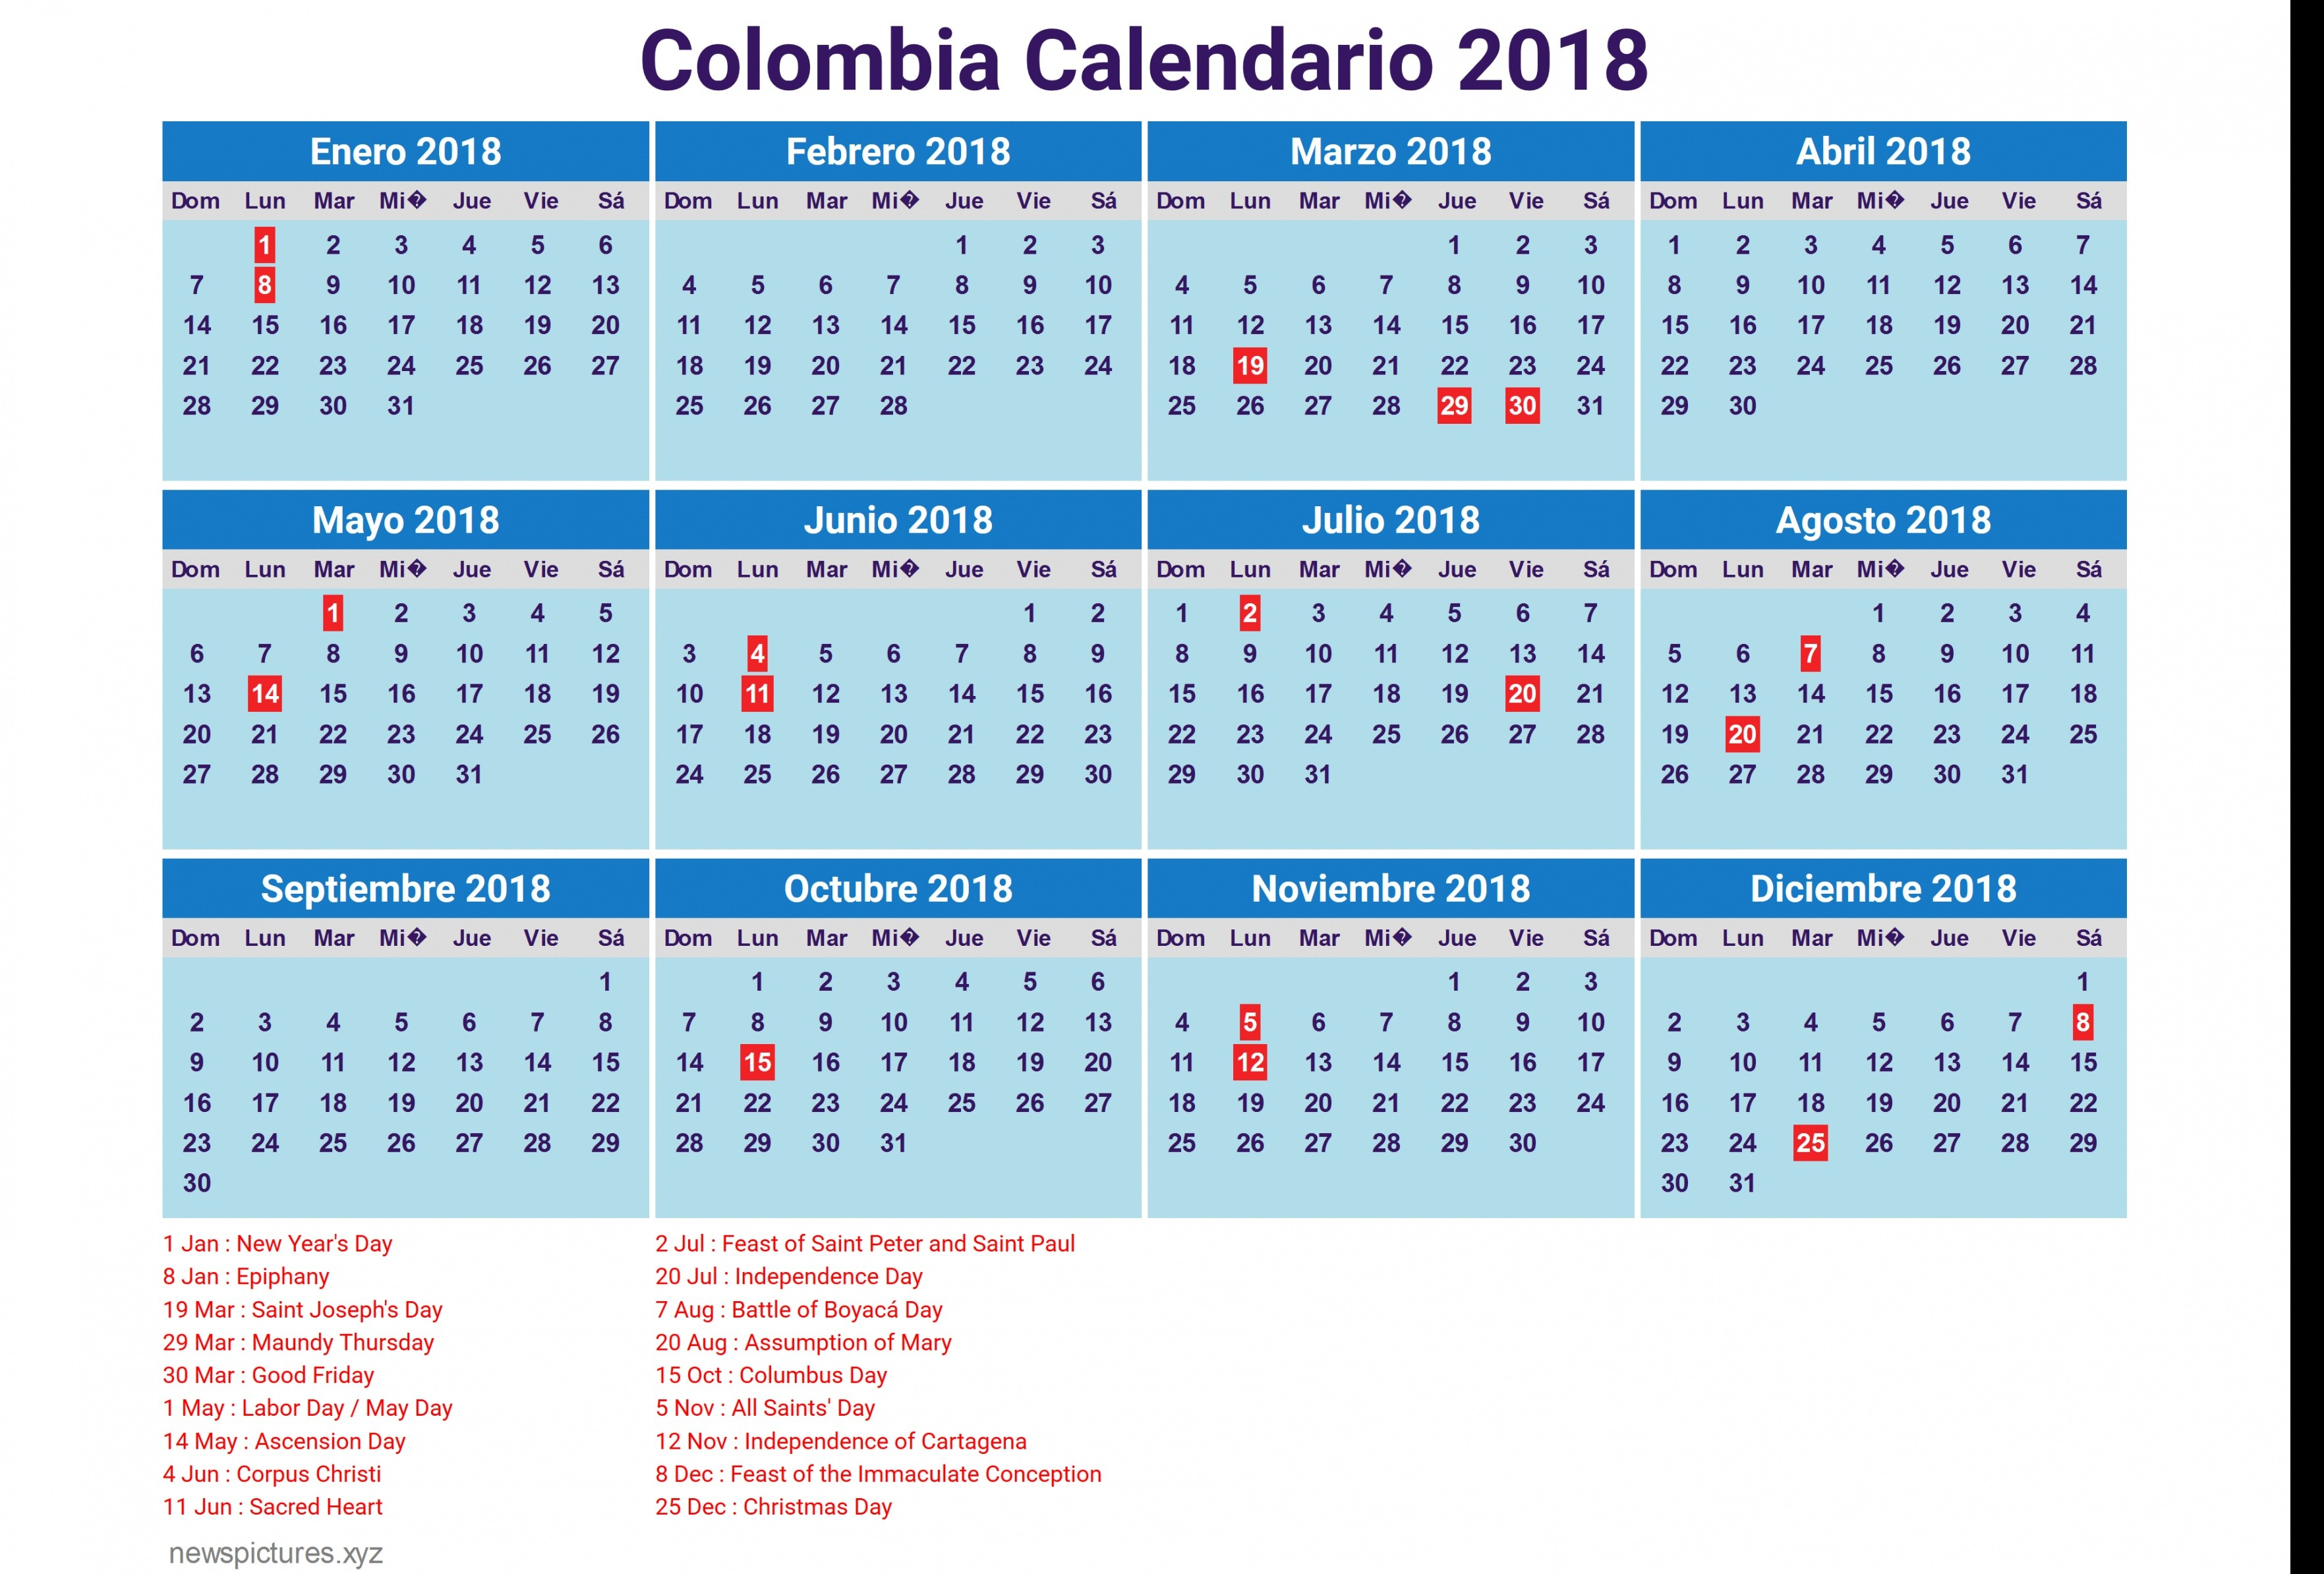 Calendario Diciembre 2017 Febrero 2018 Más Reciente Calendario 2018 Con Festivos — Fiesta De Lamusica Medellin Of Calendario Diciembre 2017 Febrero 2018 Más Reciente Verificar Calendario Diciembre 2017 Mexico Para Imprimir